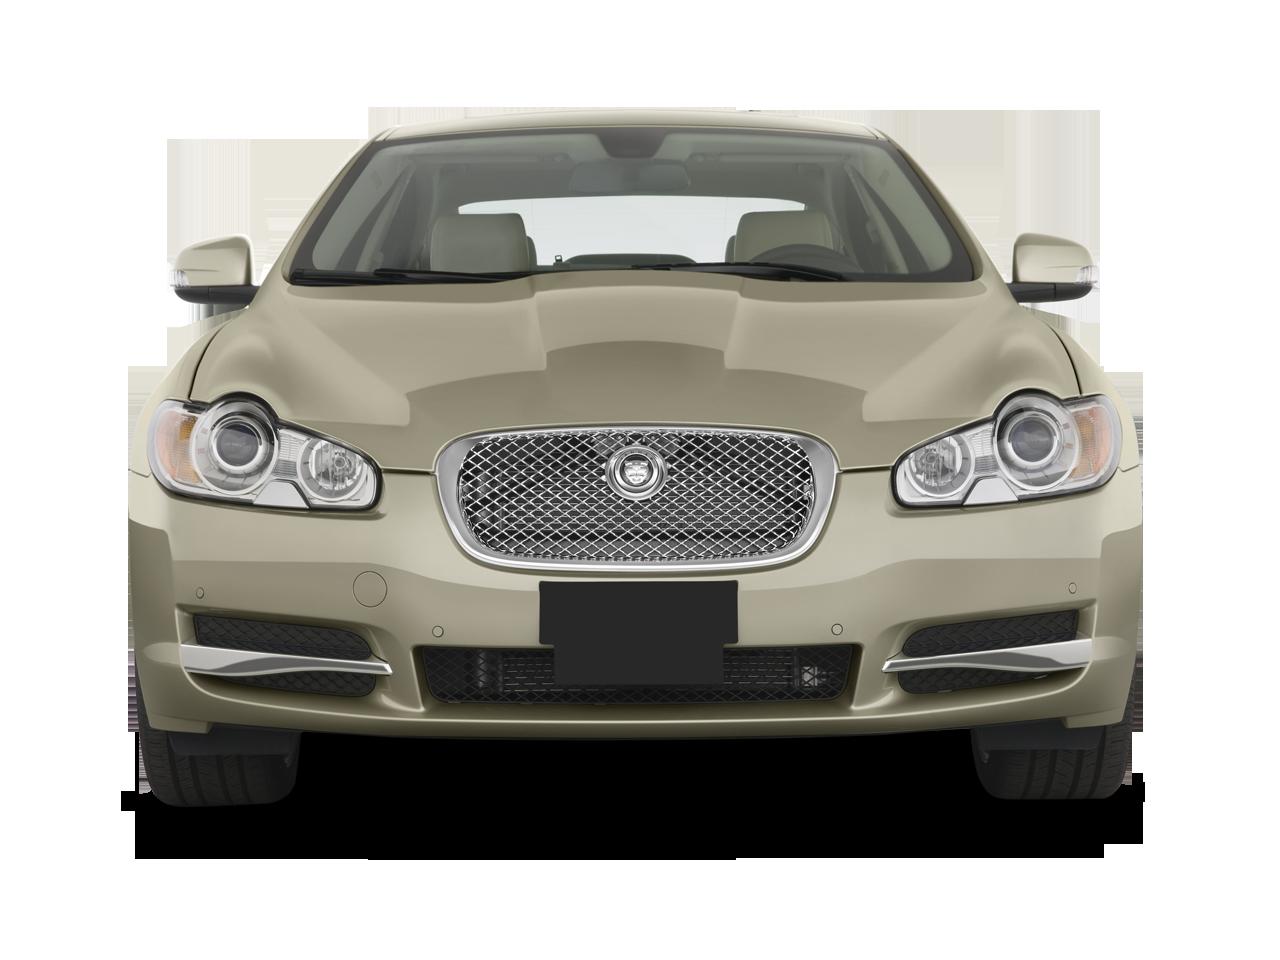 2009 jaguar xf supercharged jaguar midsize luxury sport sedan review automobile magazine. Black Bedroom Furniture Sets. Home Design Ideas